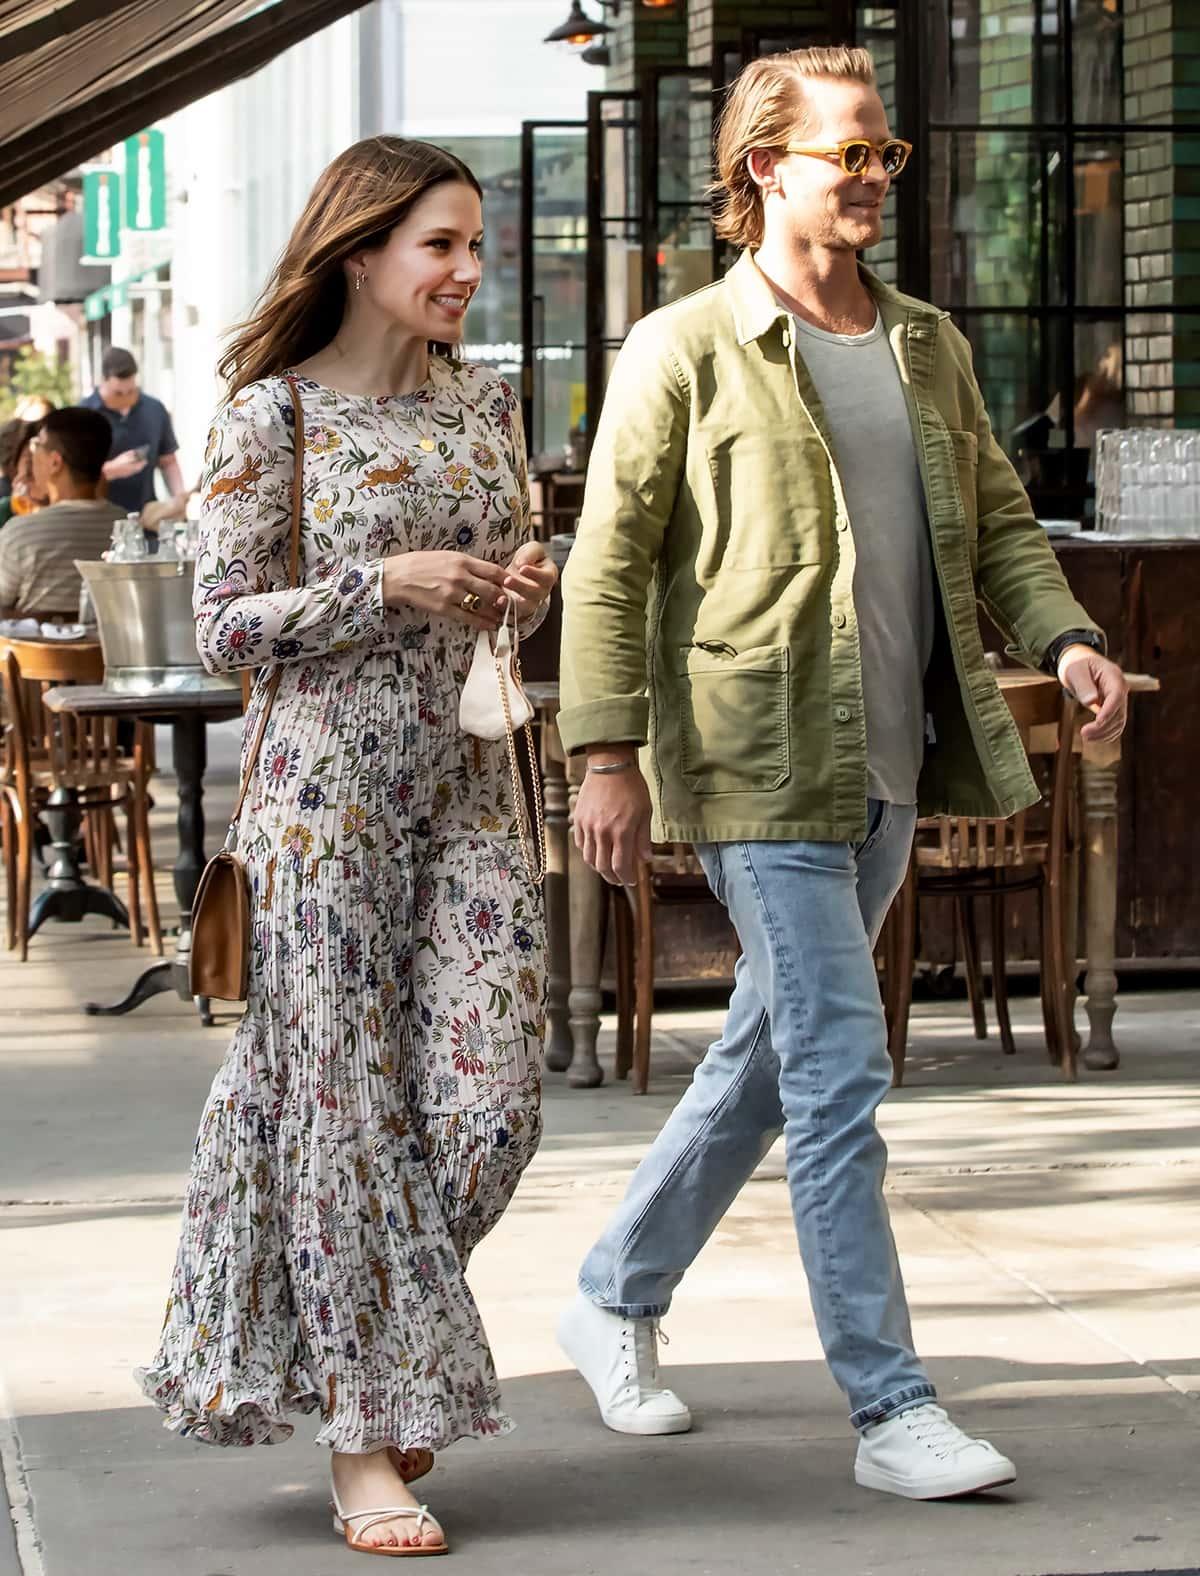 Sophia Bush and her boyfriend Grant Hughes on a date